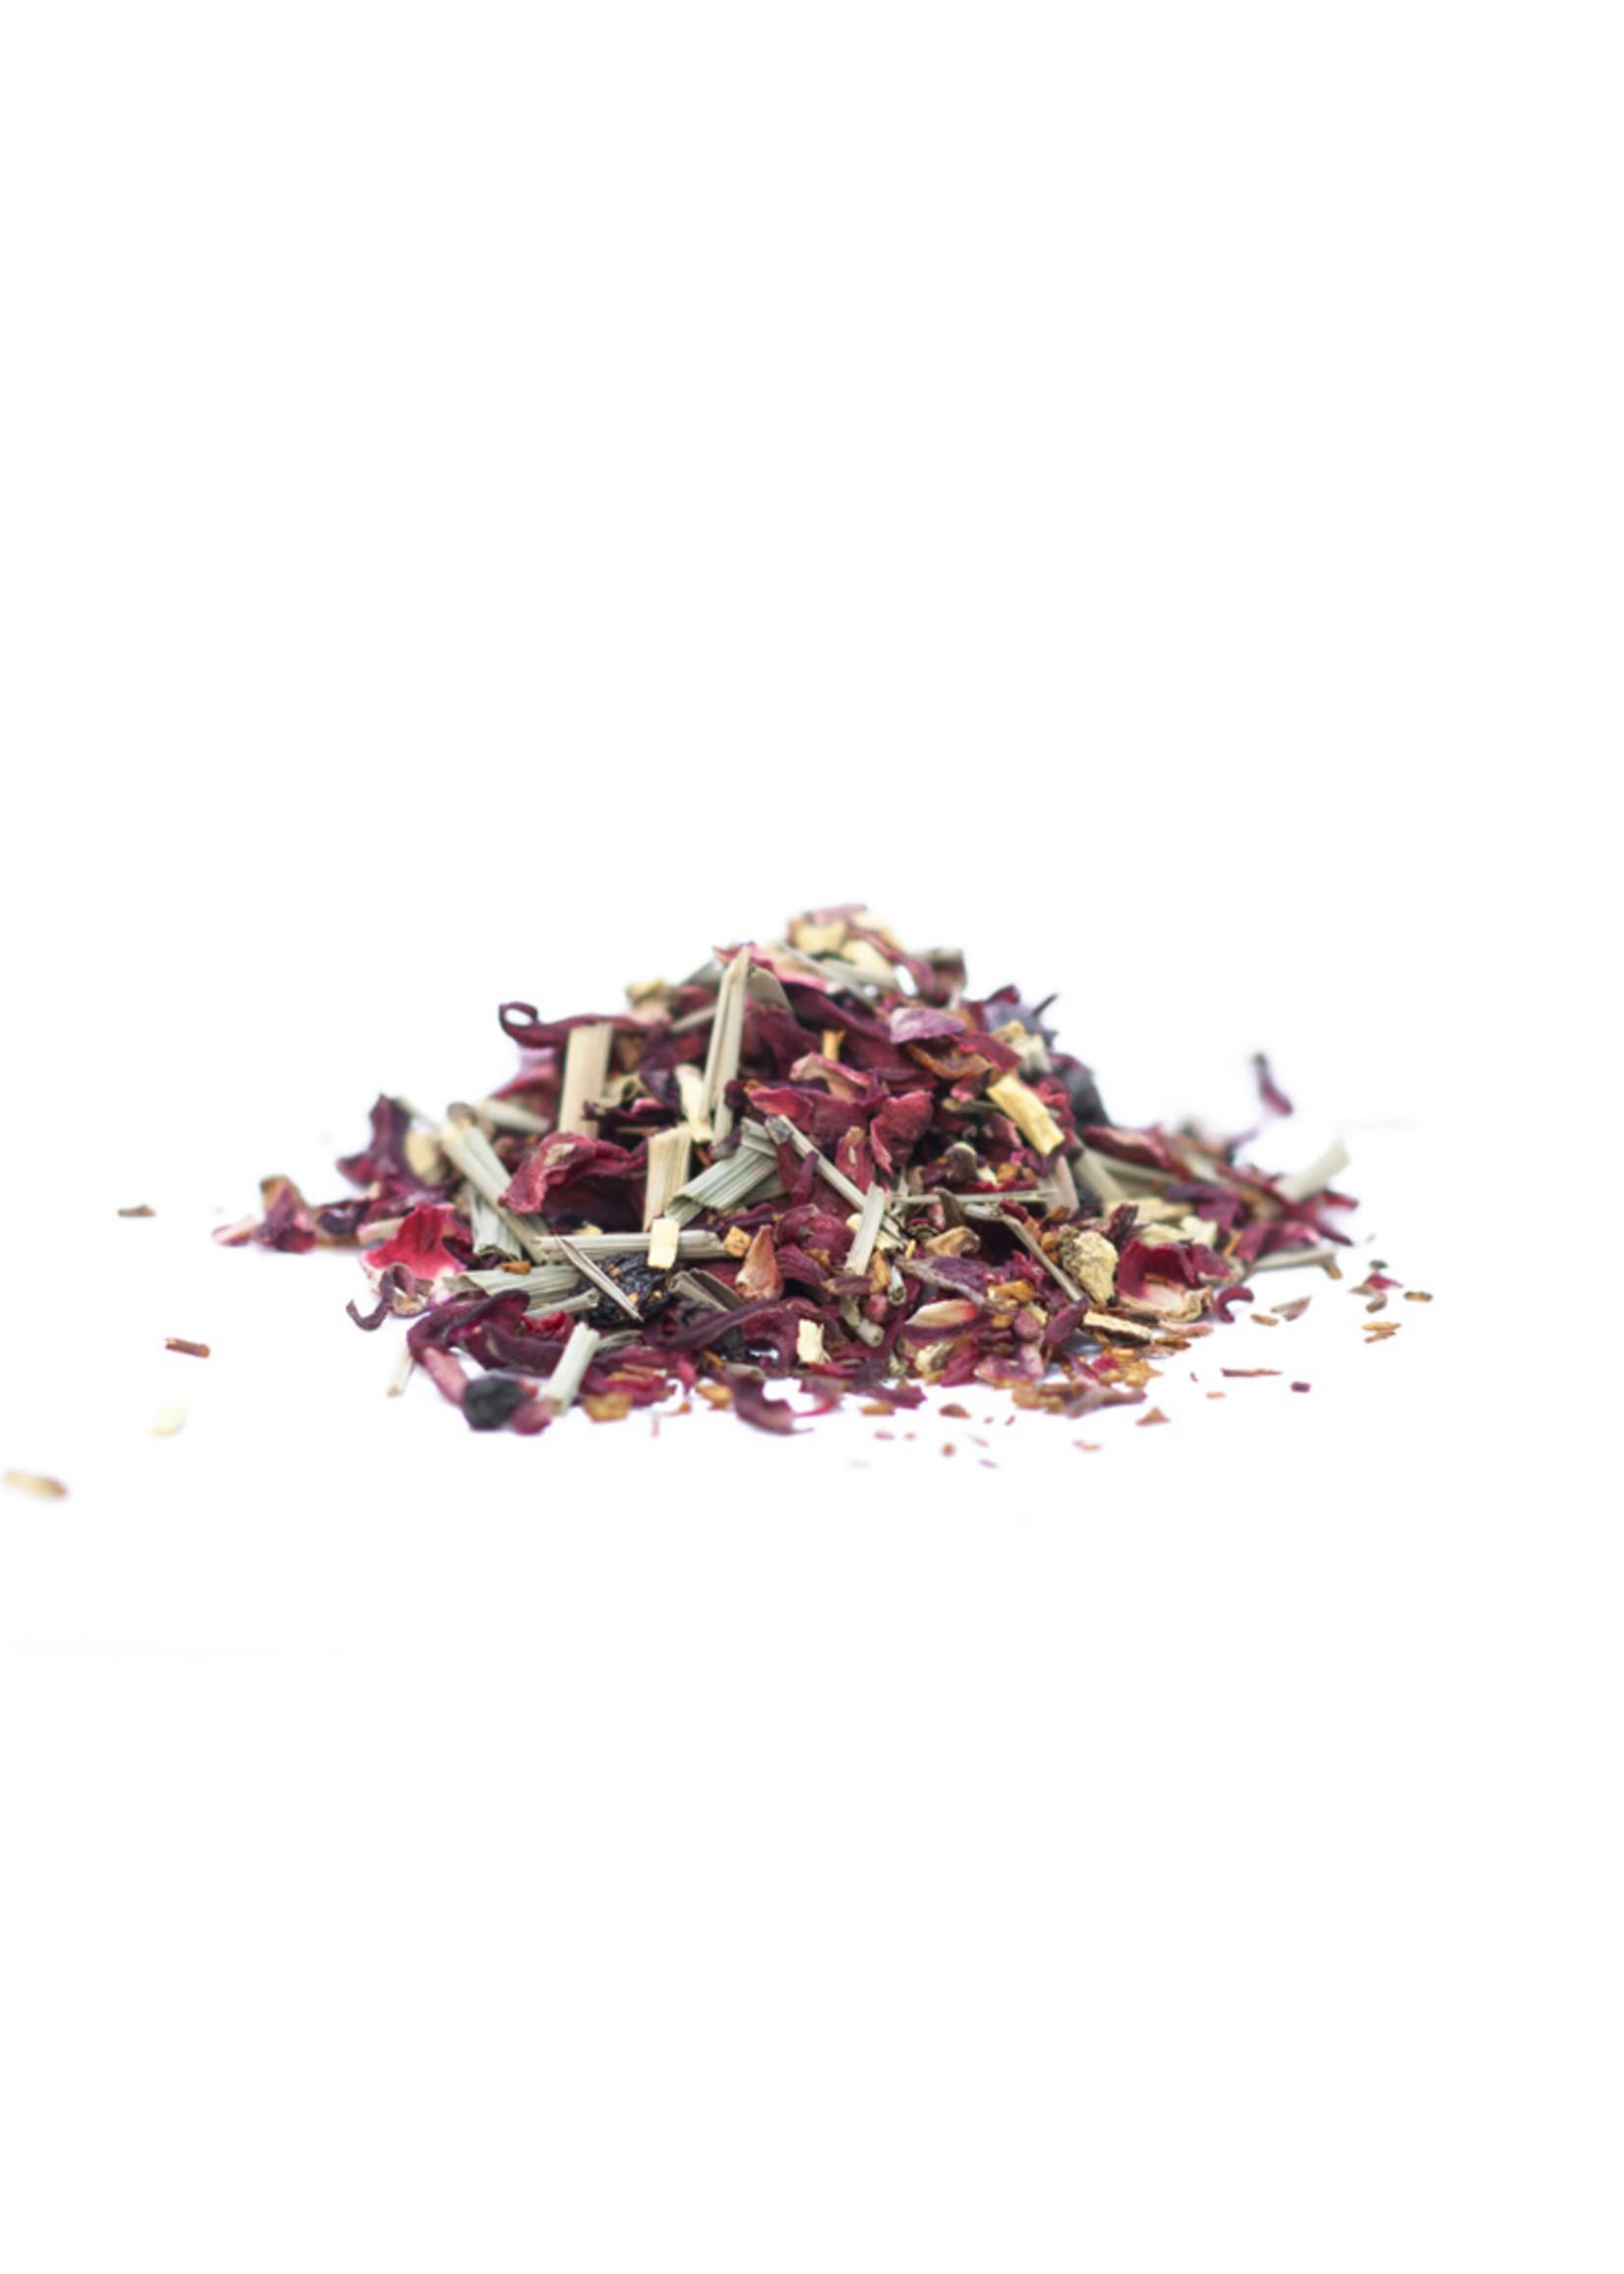 JusTea Loose Leaf Tea - Little Berry Hibiscus